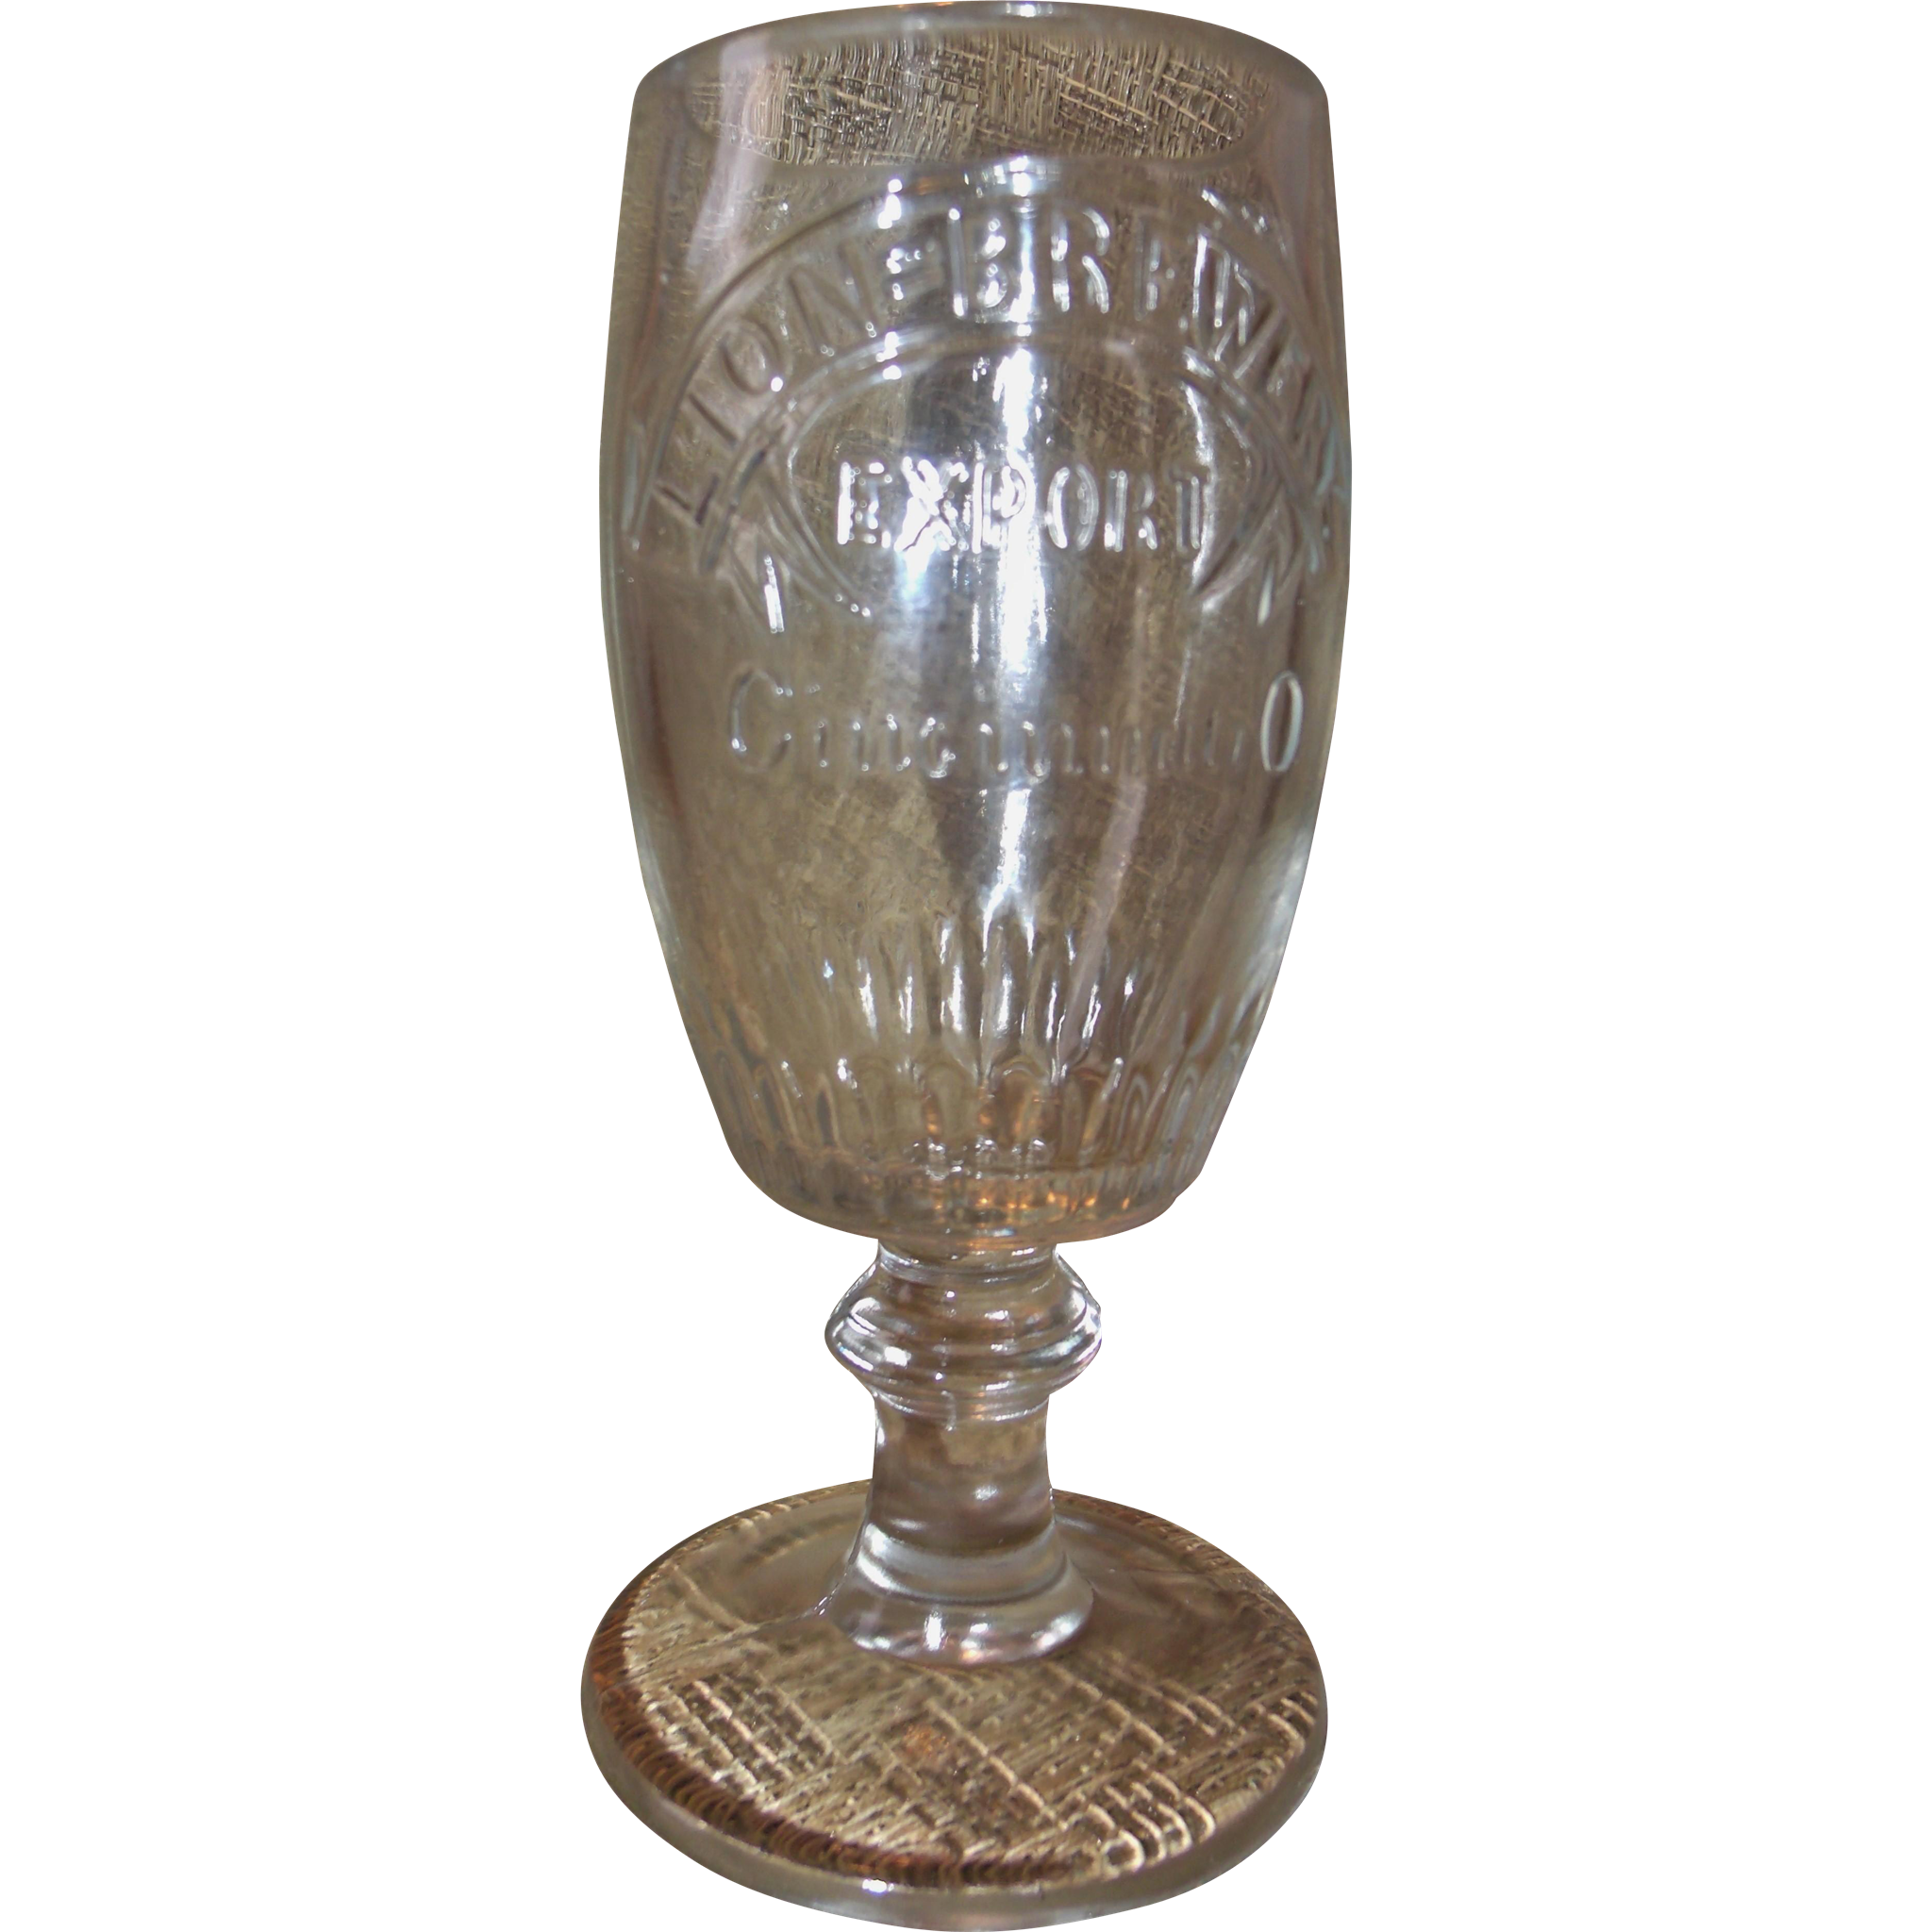 Vintage Rare Beer Glass Lion Brewery Cincinnati Ohio Beer Goblet Pre-prohibition Windisch-Muhlhauser Brewing